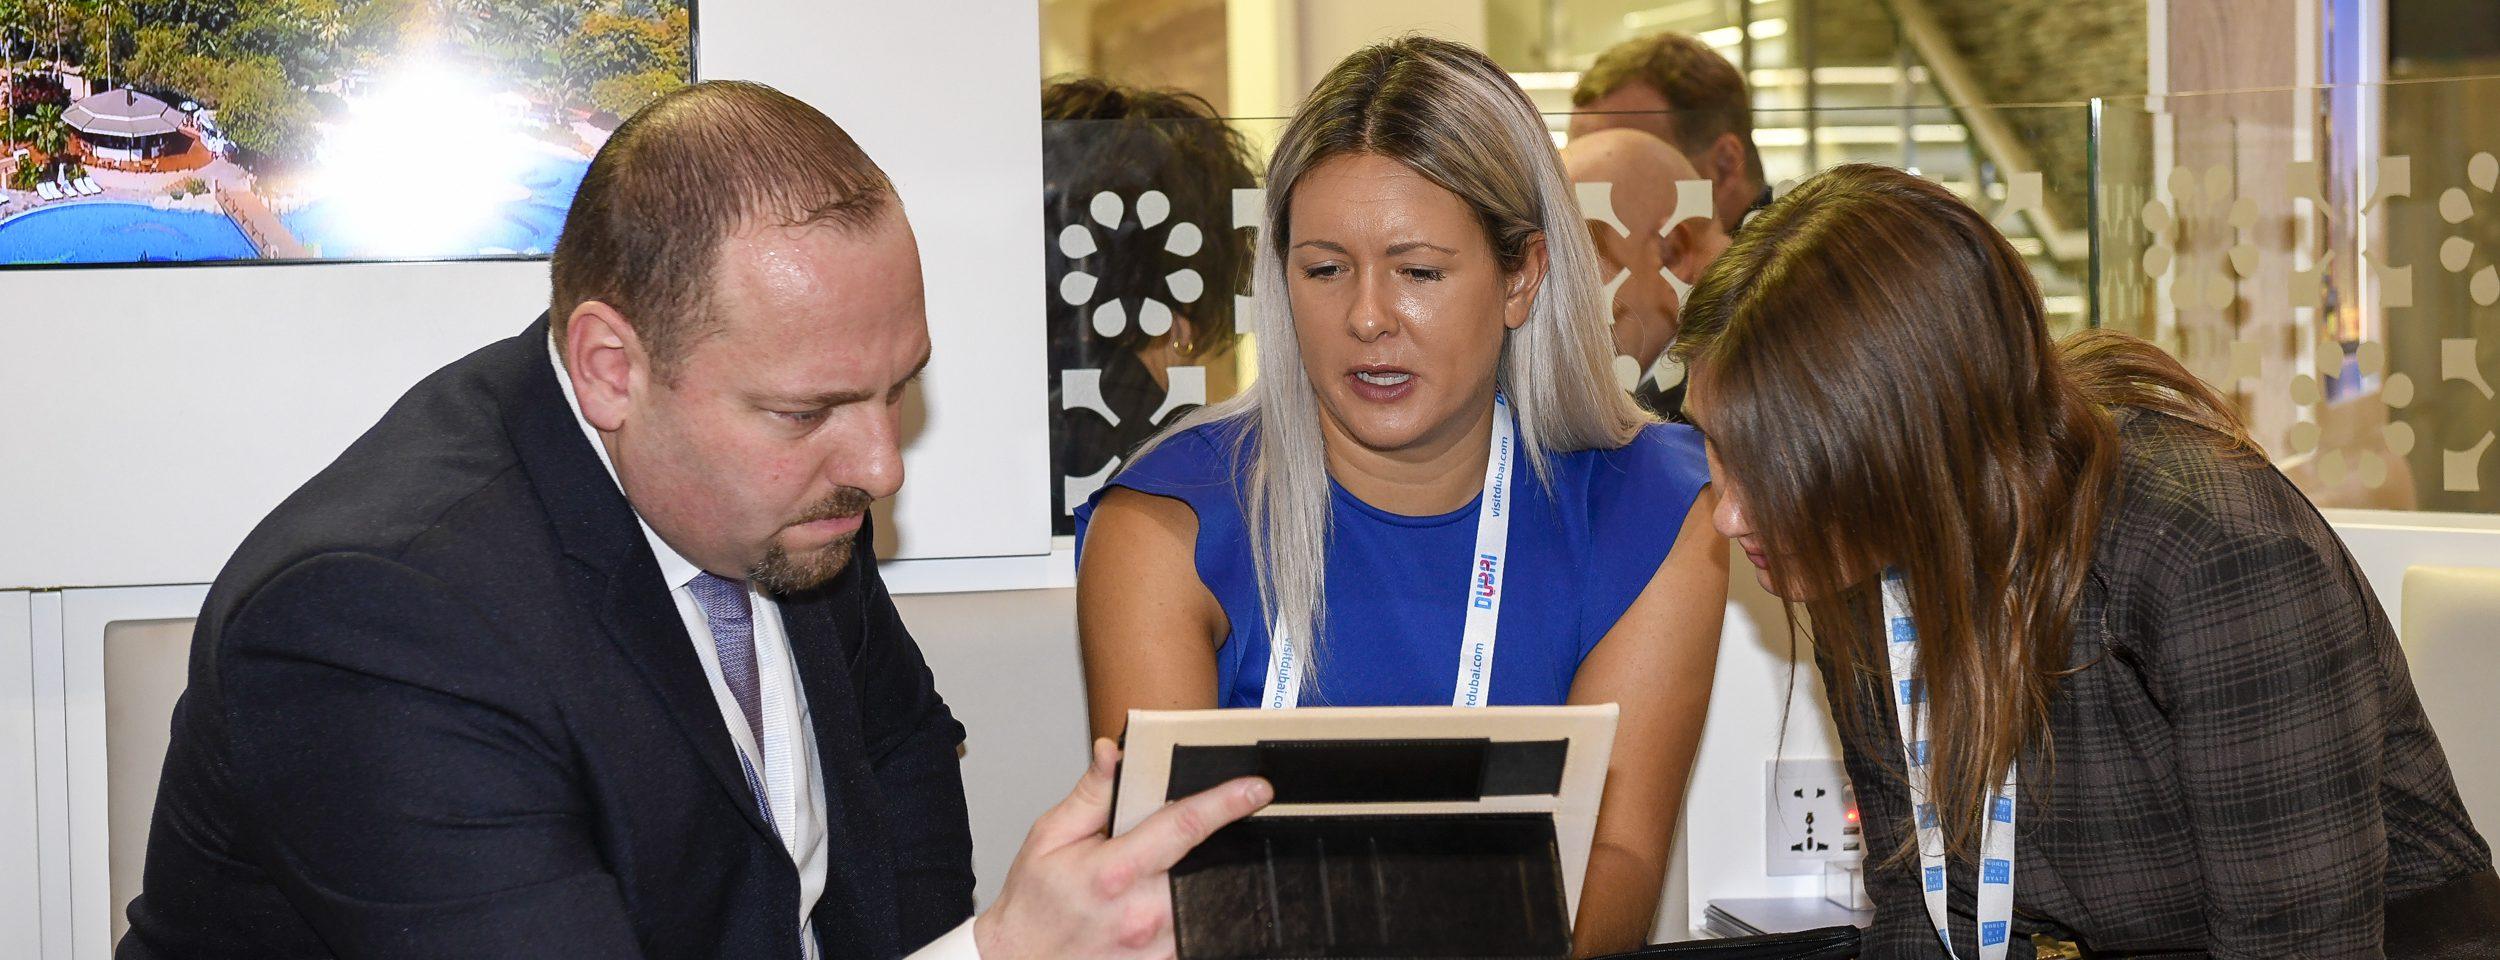 WTM London 2018 Facilitates a Record £3.4 Billion in Travel Industry Deals